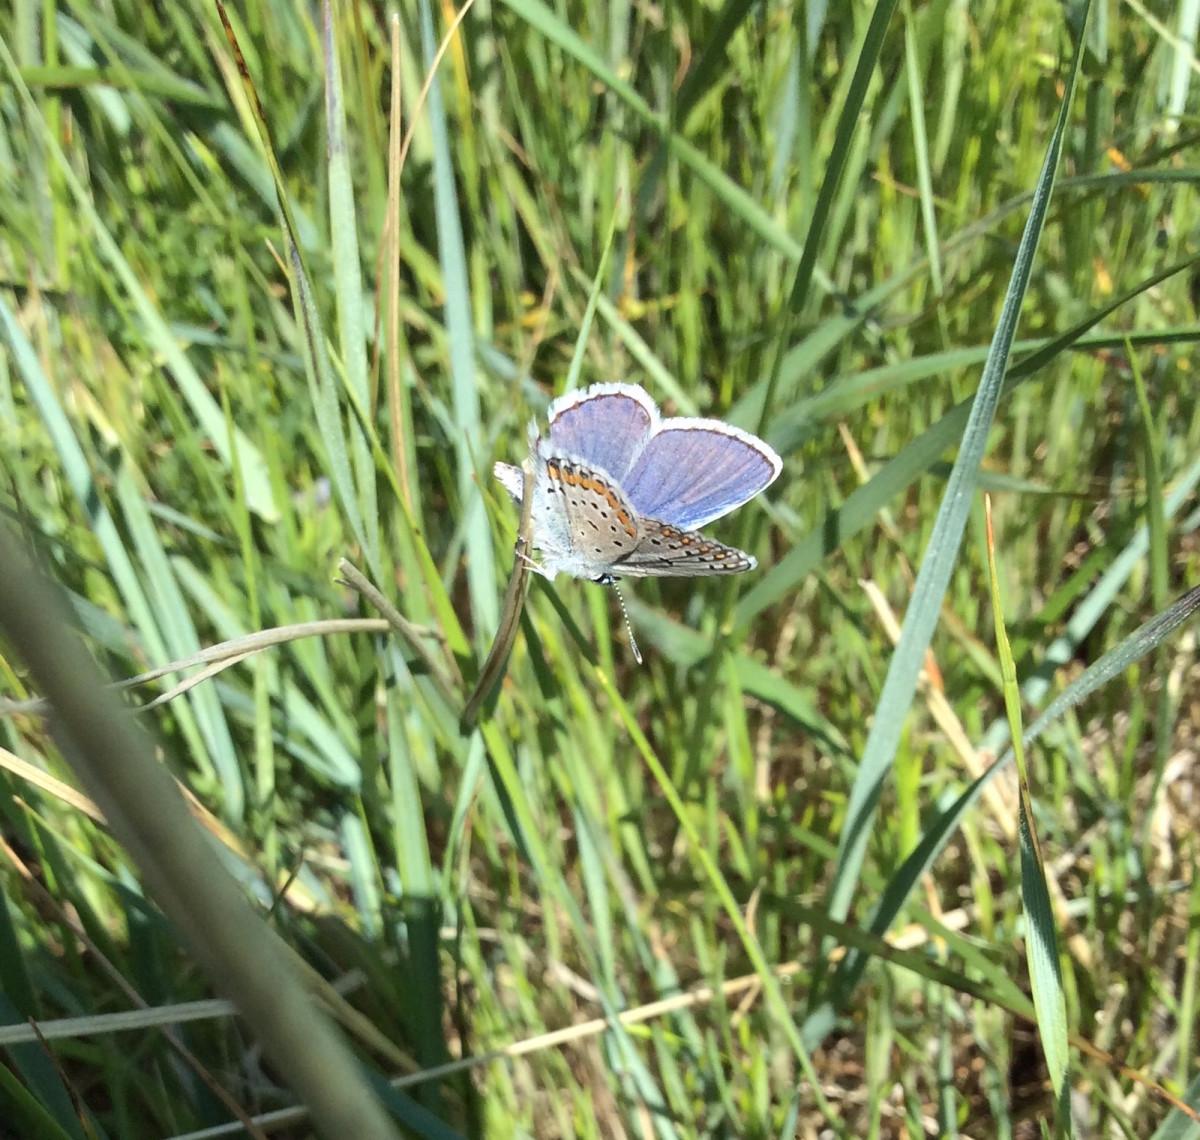 Badlands-Nationalpark-South-Dakota-USA-24